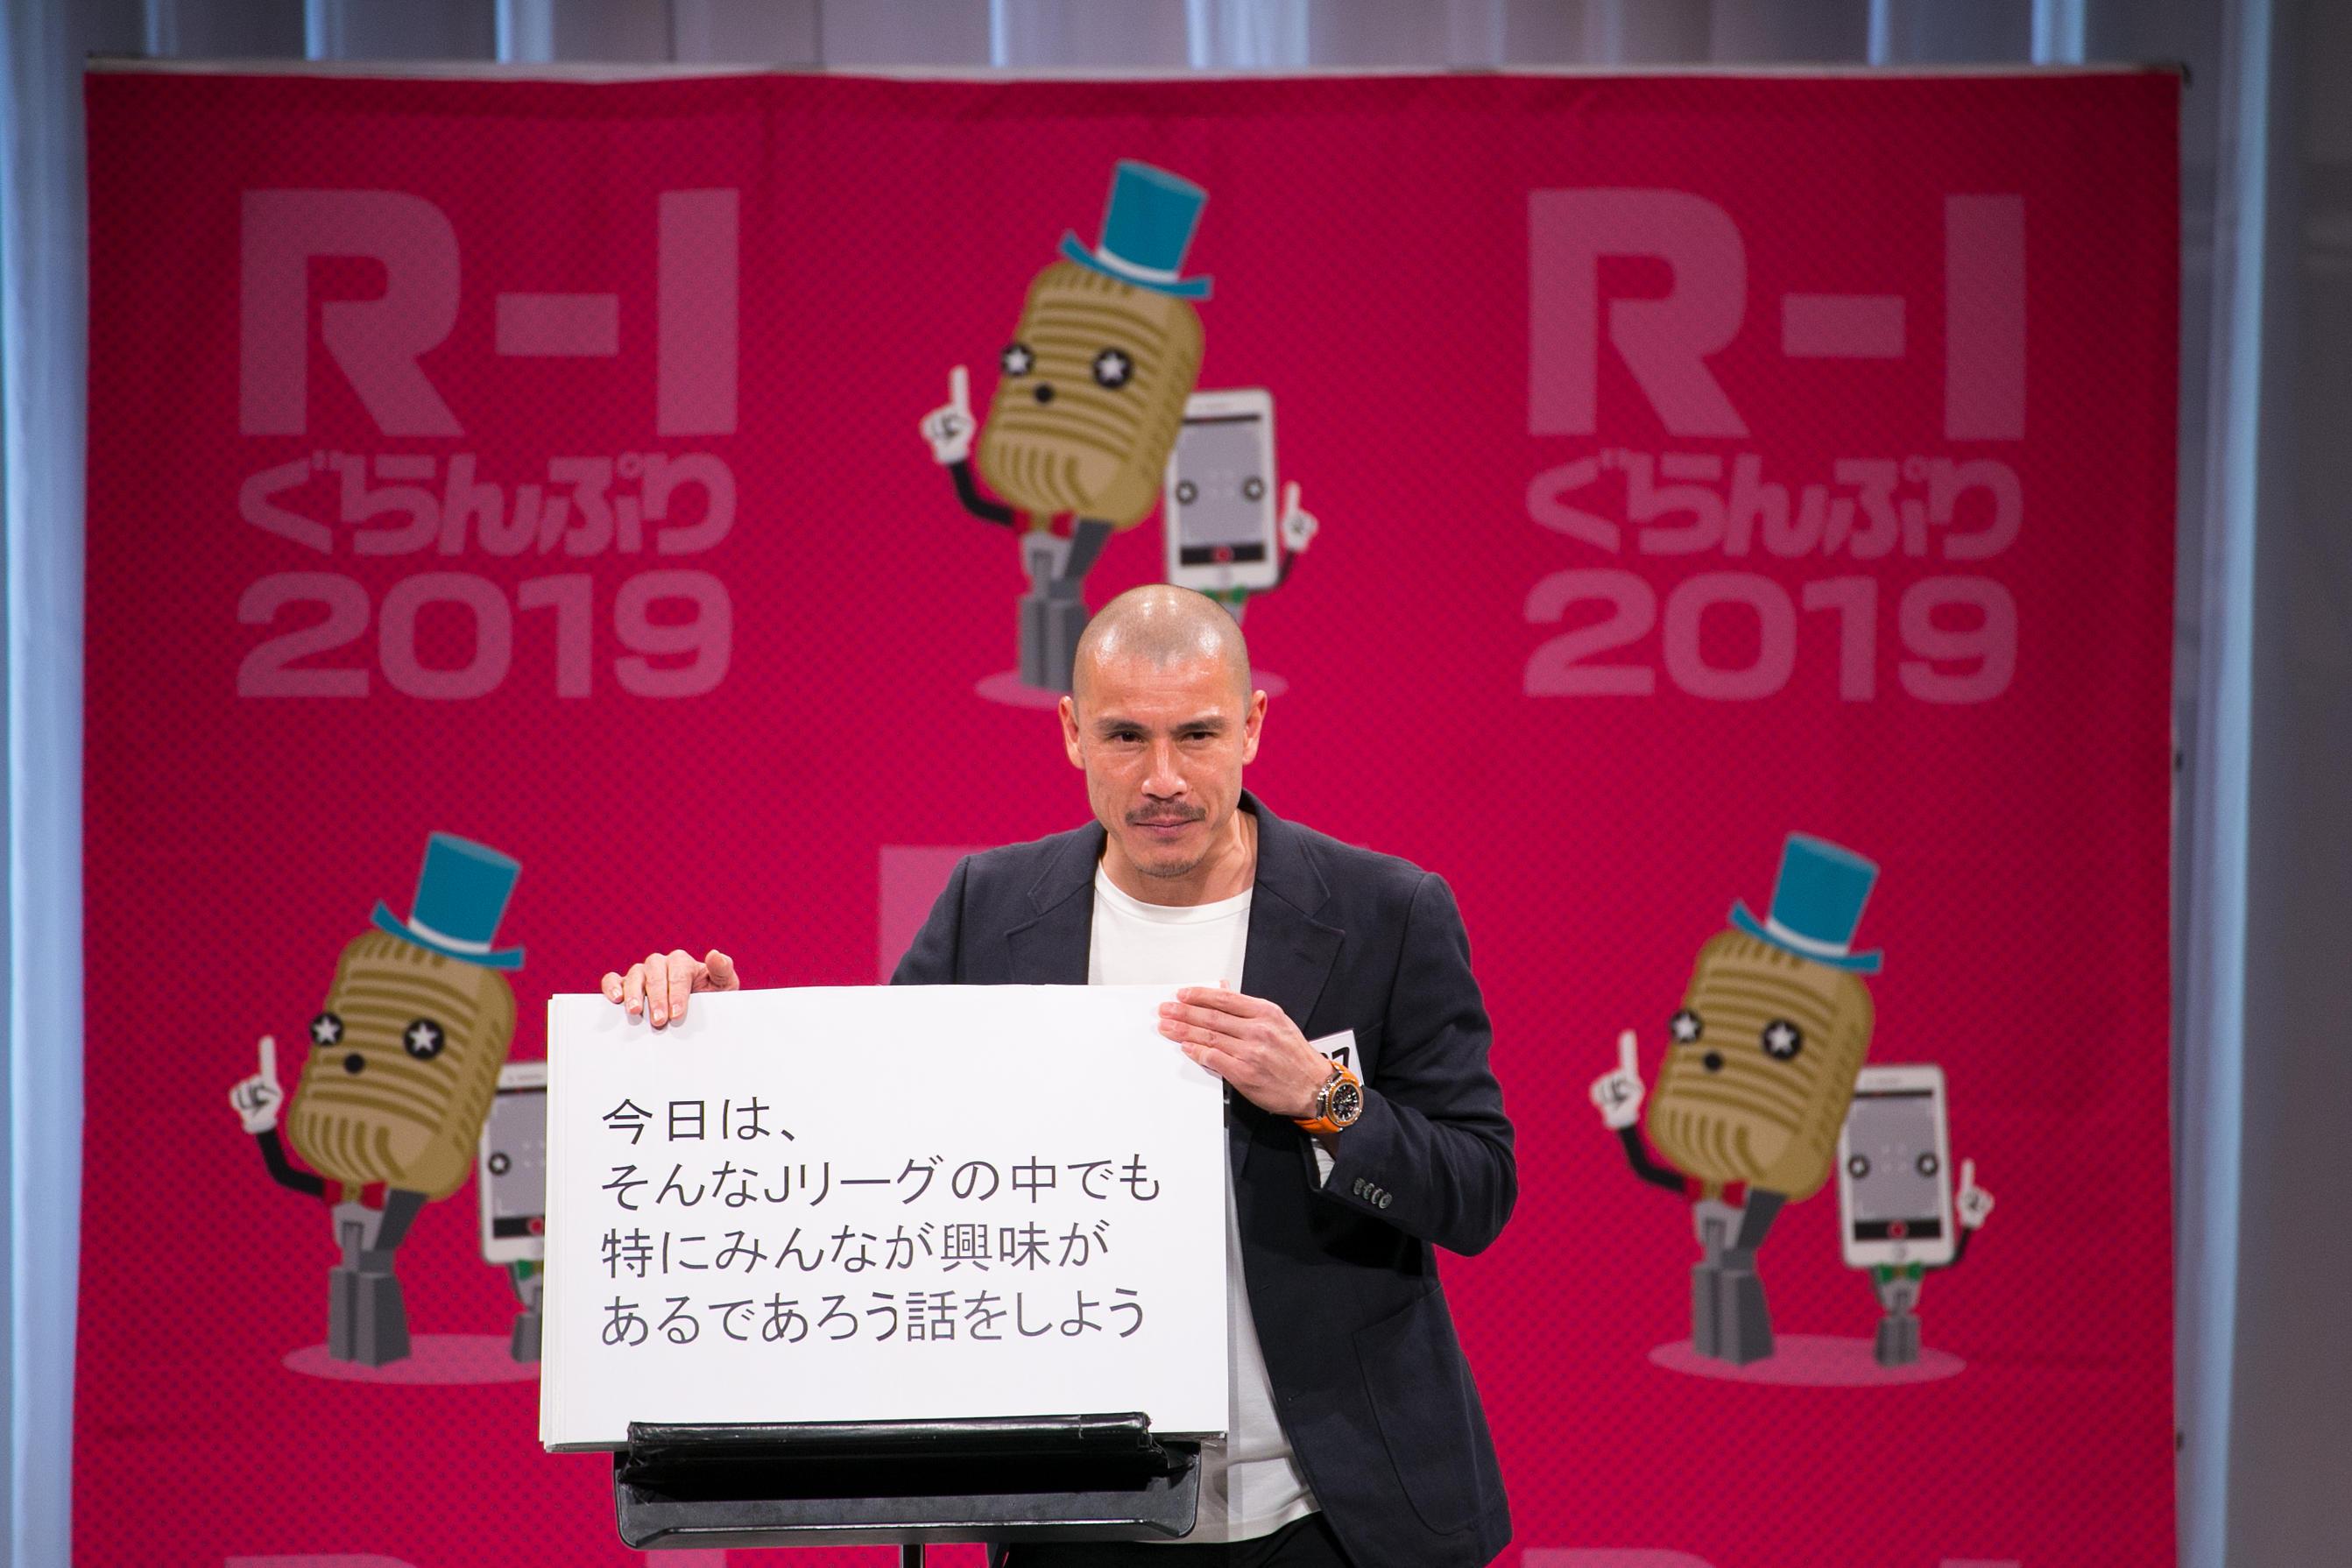 http://news.yoshimoto.co.jp/20190129222844-6dcf3b29c26d9a69c0913c1801f8f69208e42dd4.jpg